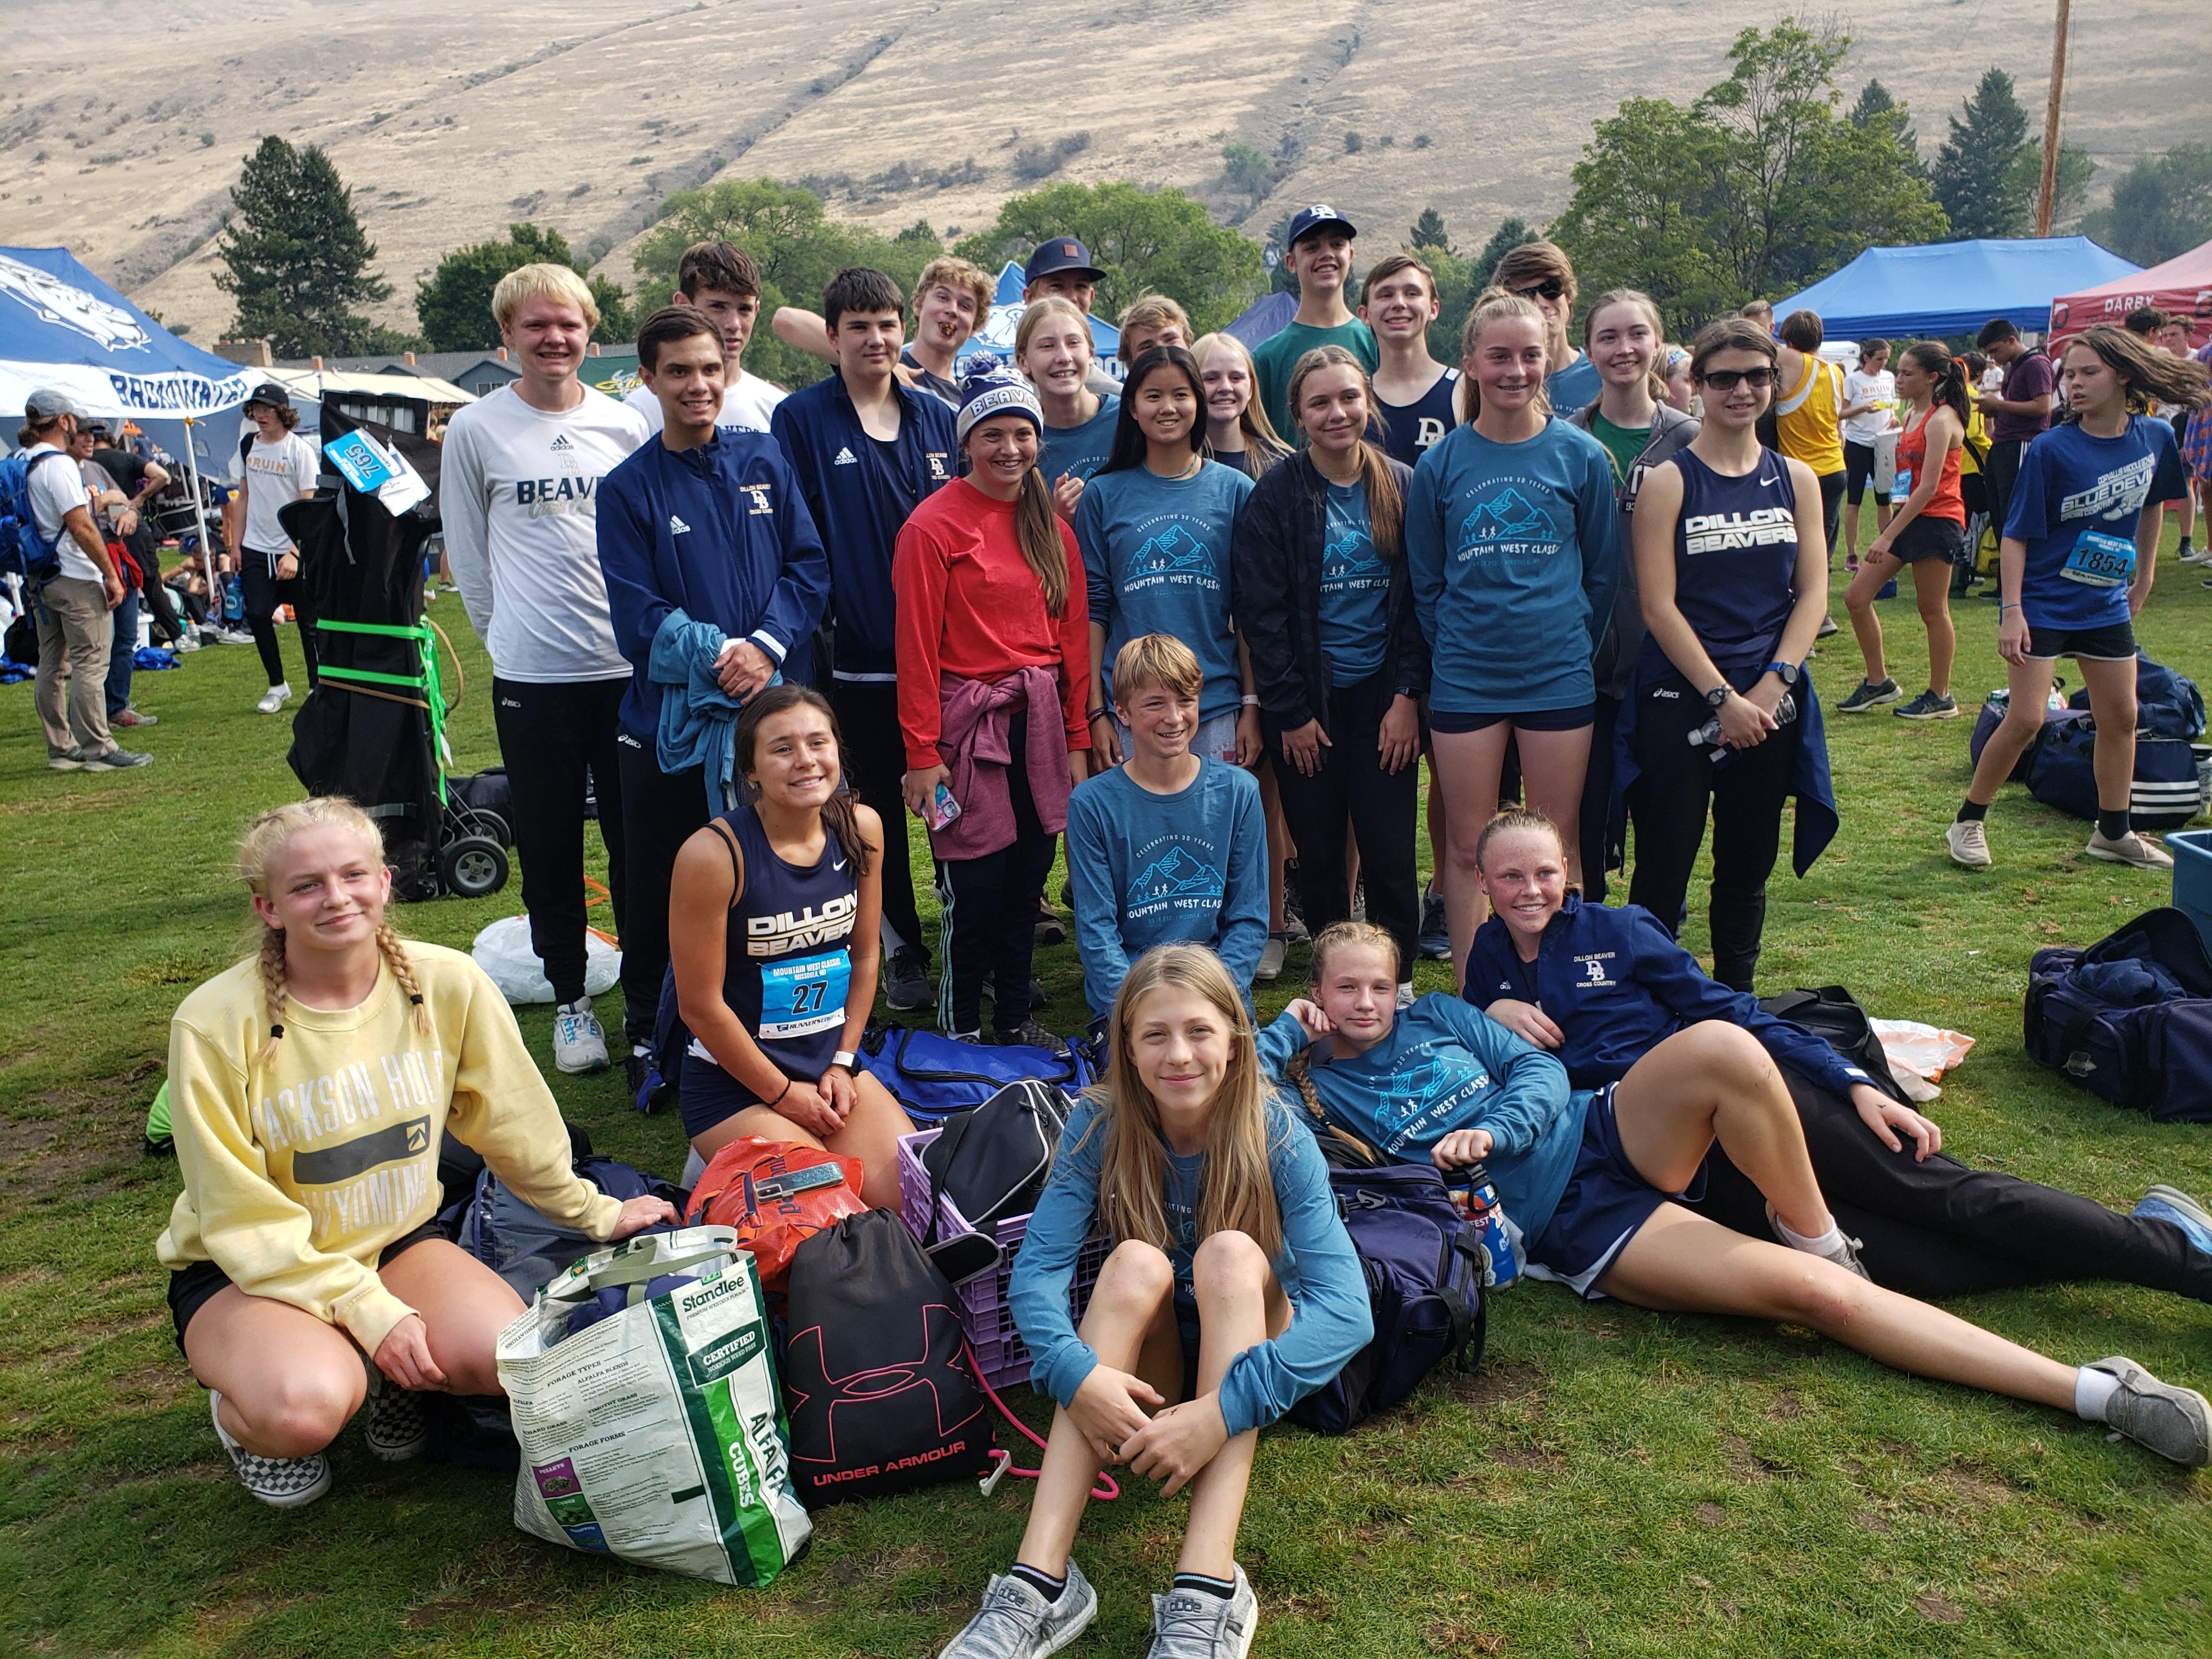 Team Mountain West